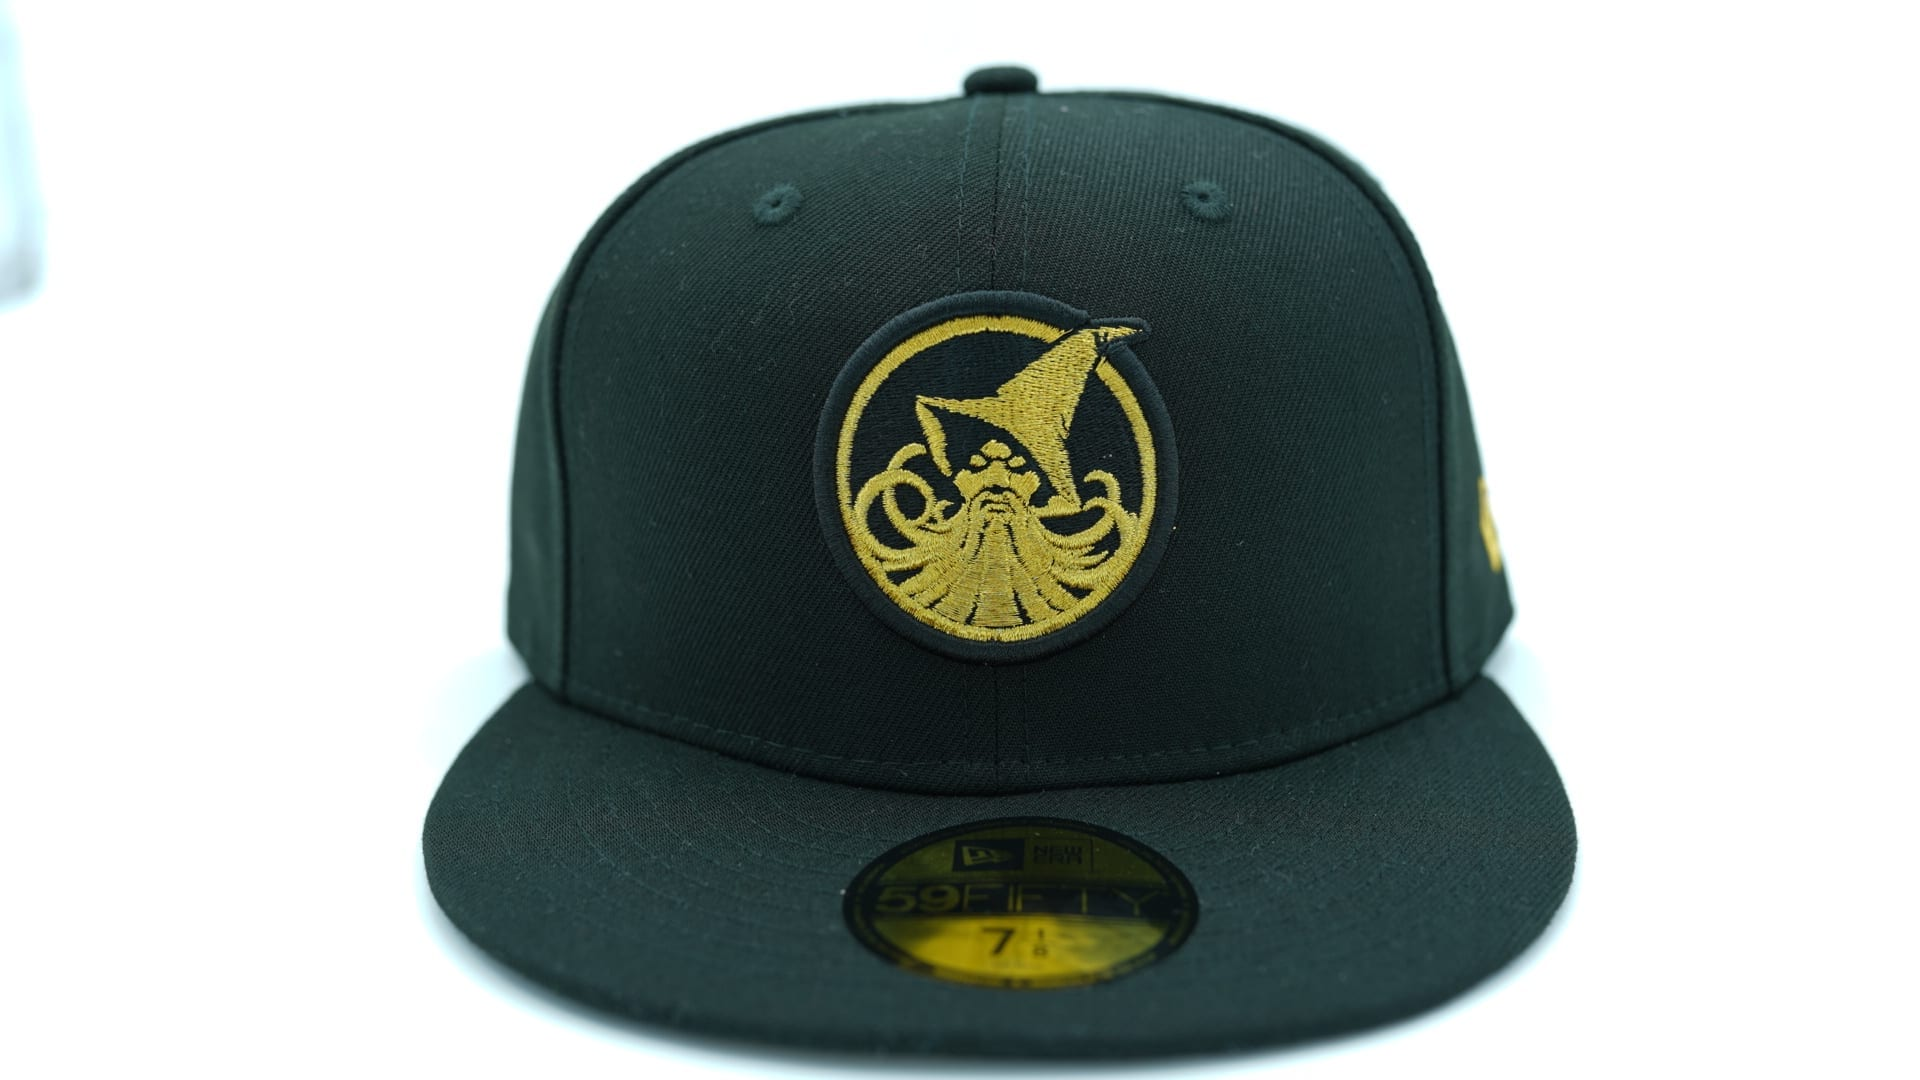 angel_halo-fitted-baseball-cap.jpg